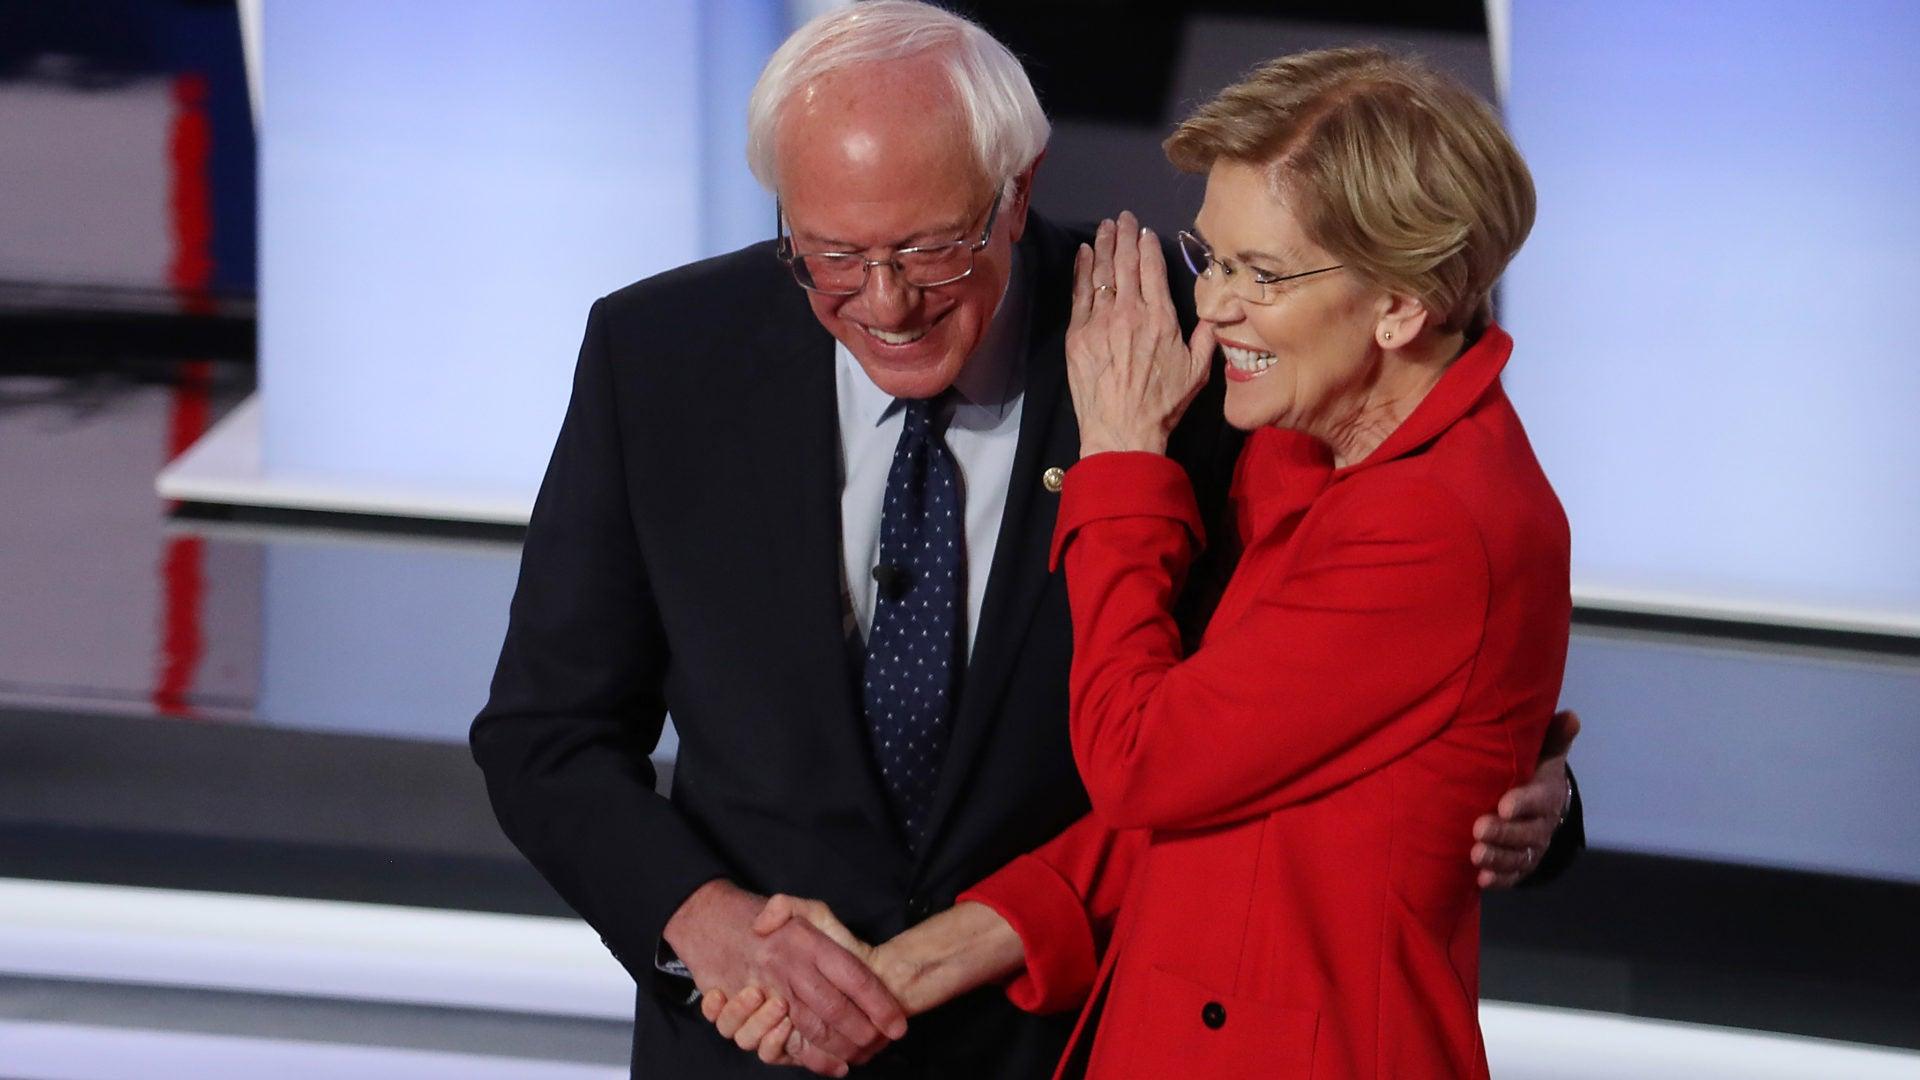 Opinion: Bernie Sanders And Elizabeth Warren Take On The Unimaginative Centrists In CNN Debate